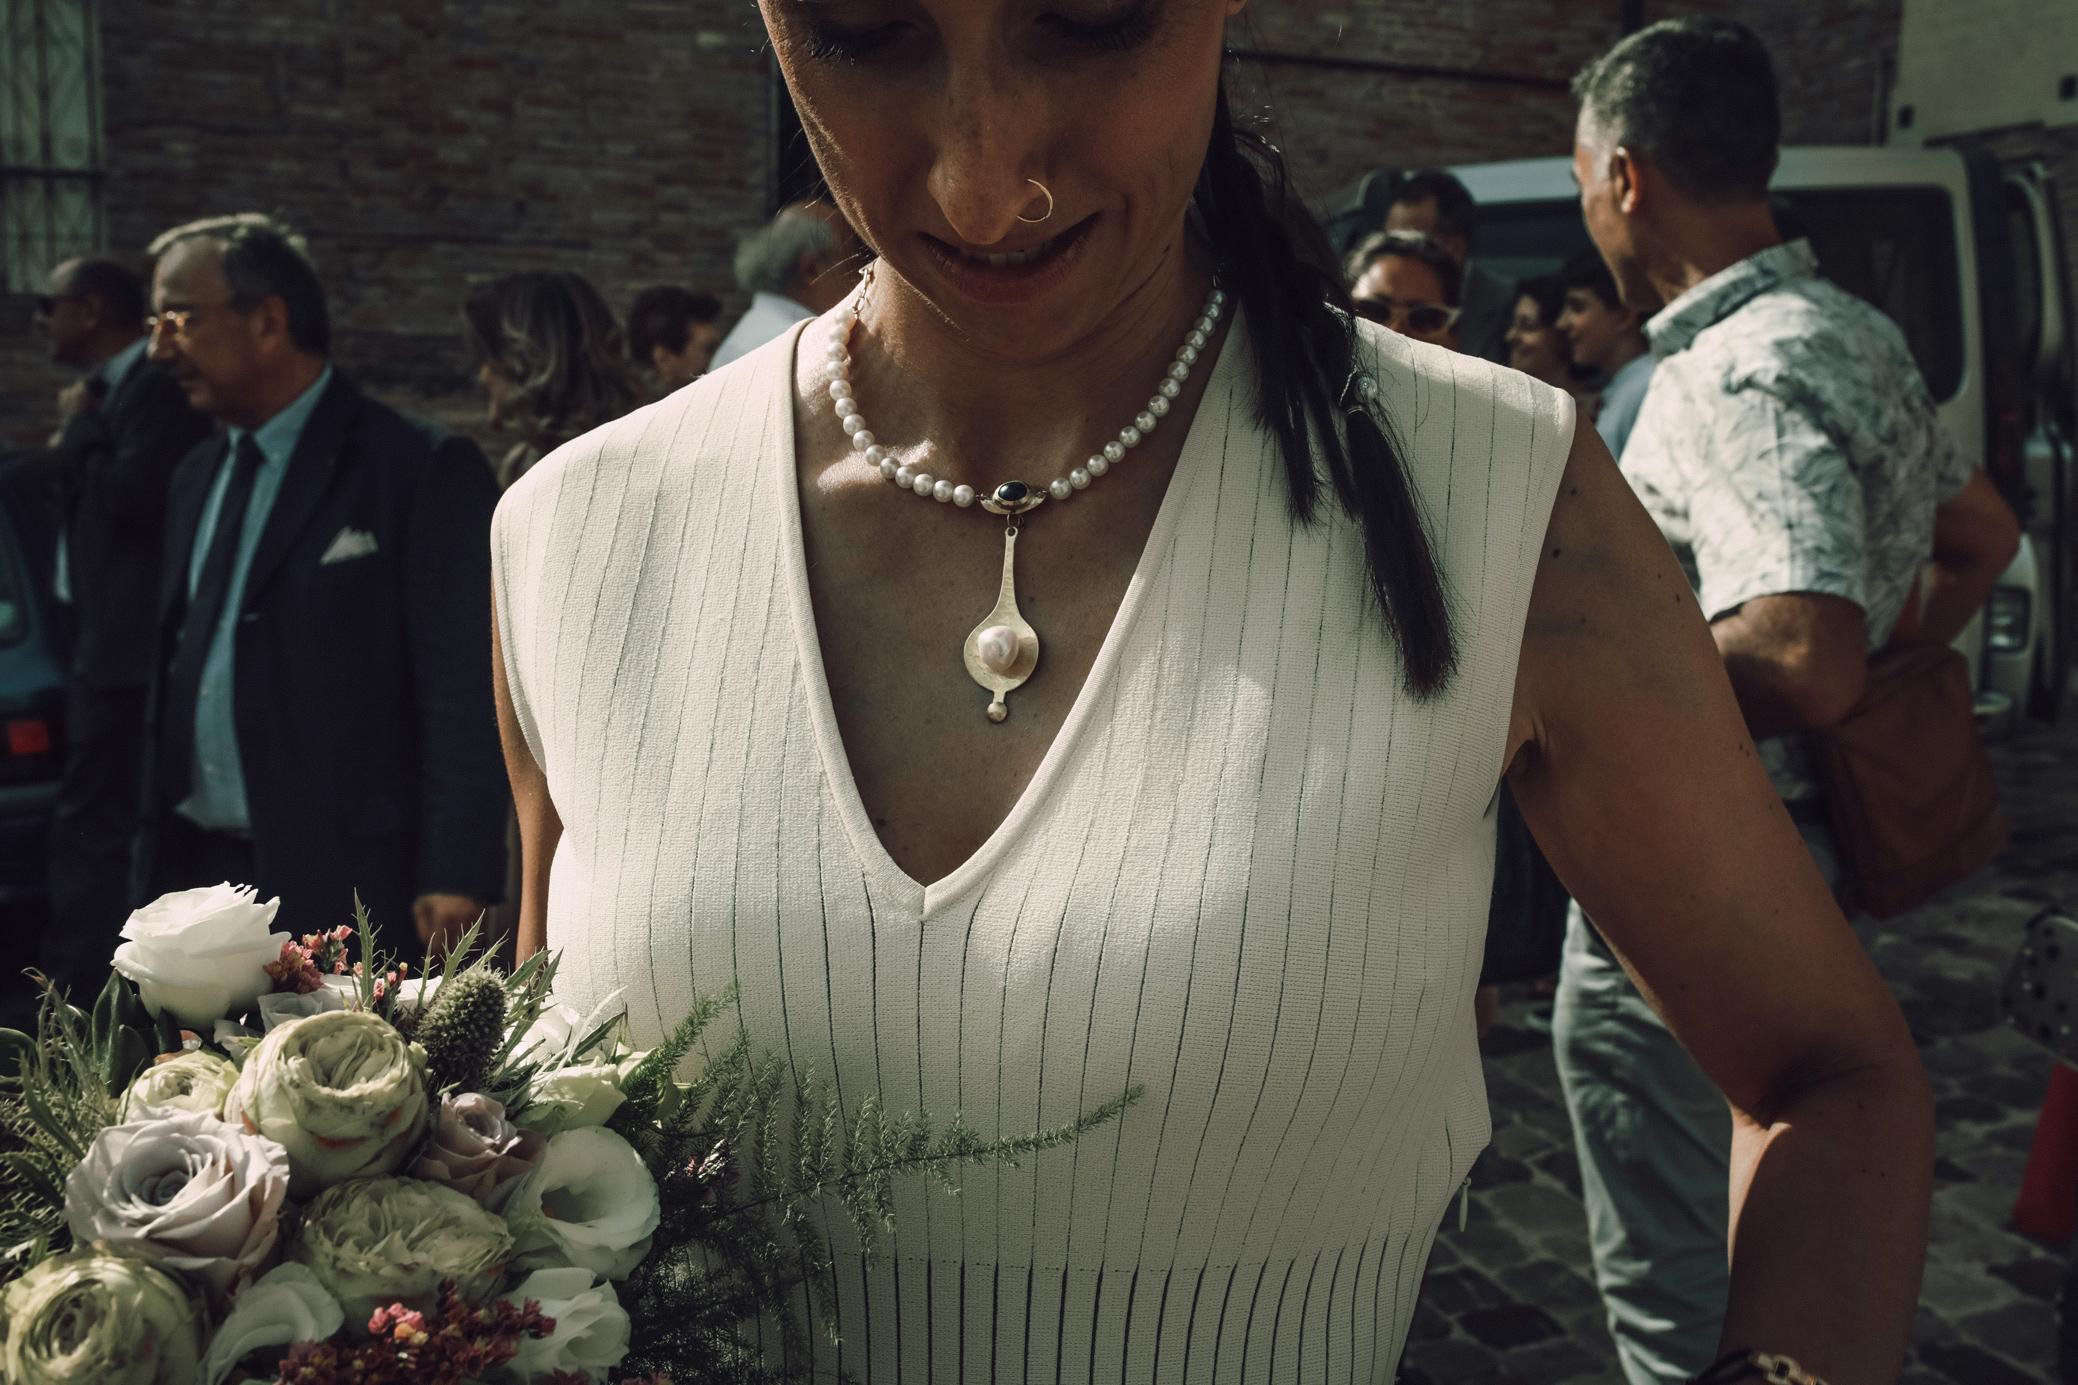 Erica-e-Vanni-147.jpg